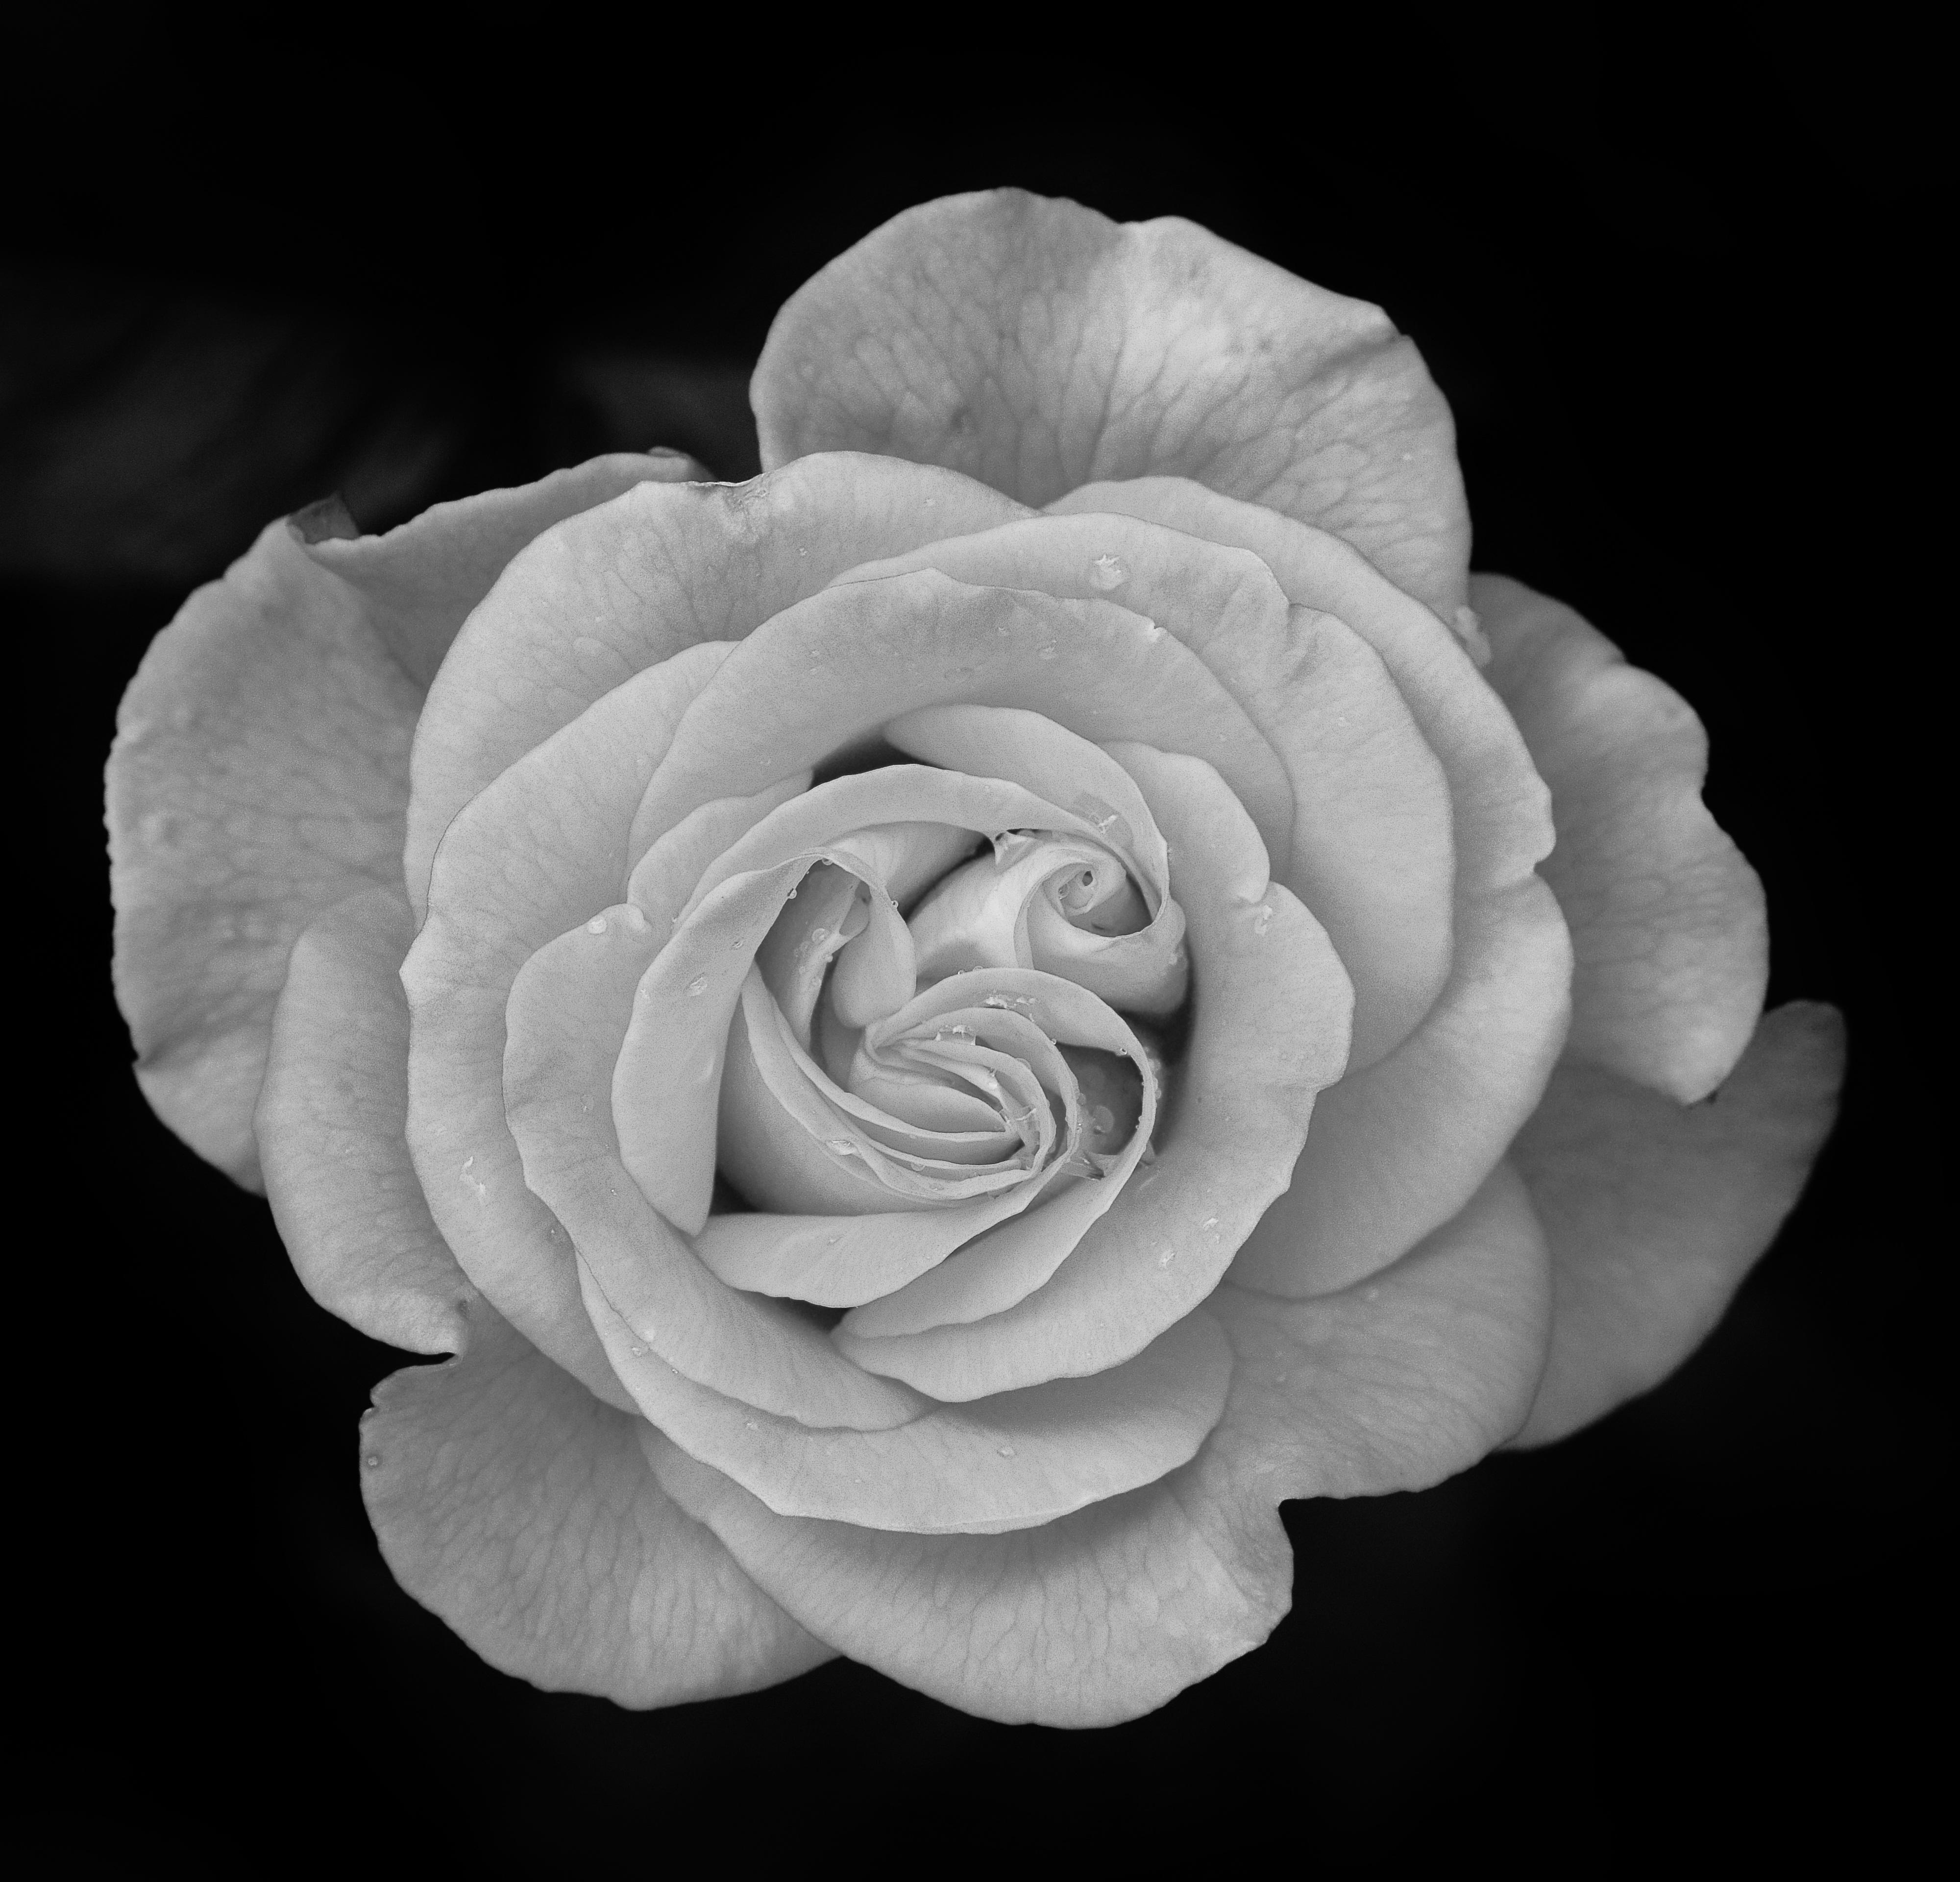 Garden Roses Flower Petal: Free Images : Nature, Blossom, Black And White, Flower